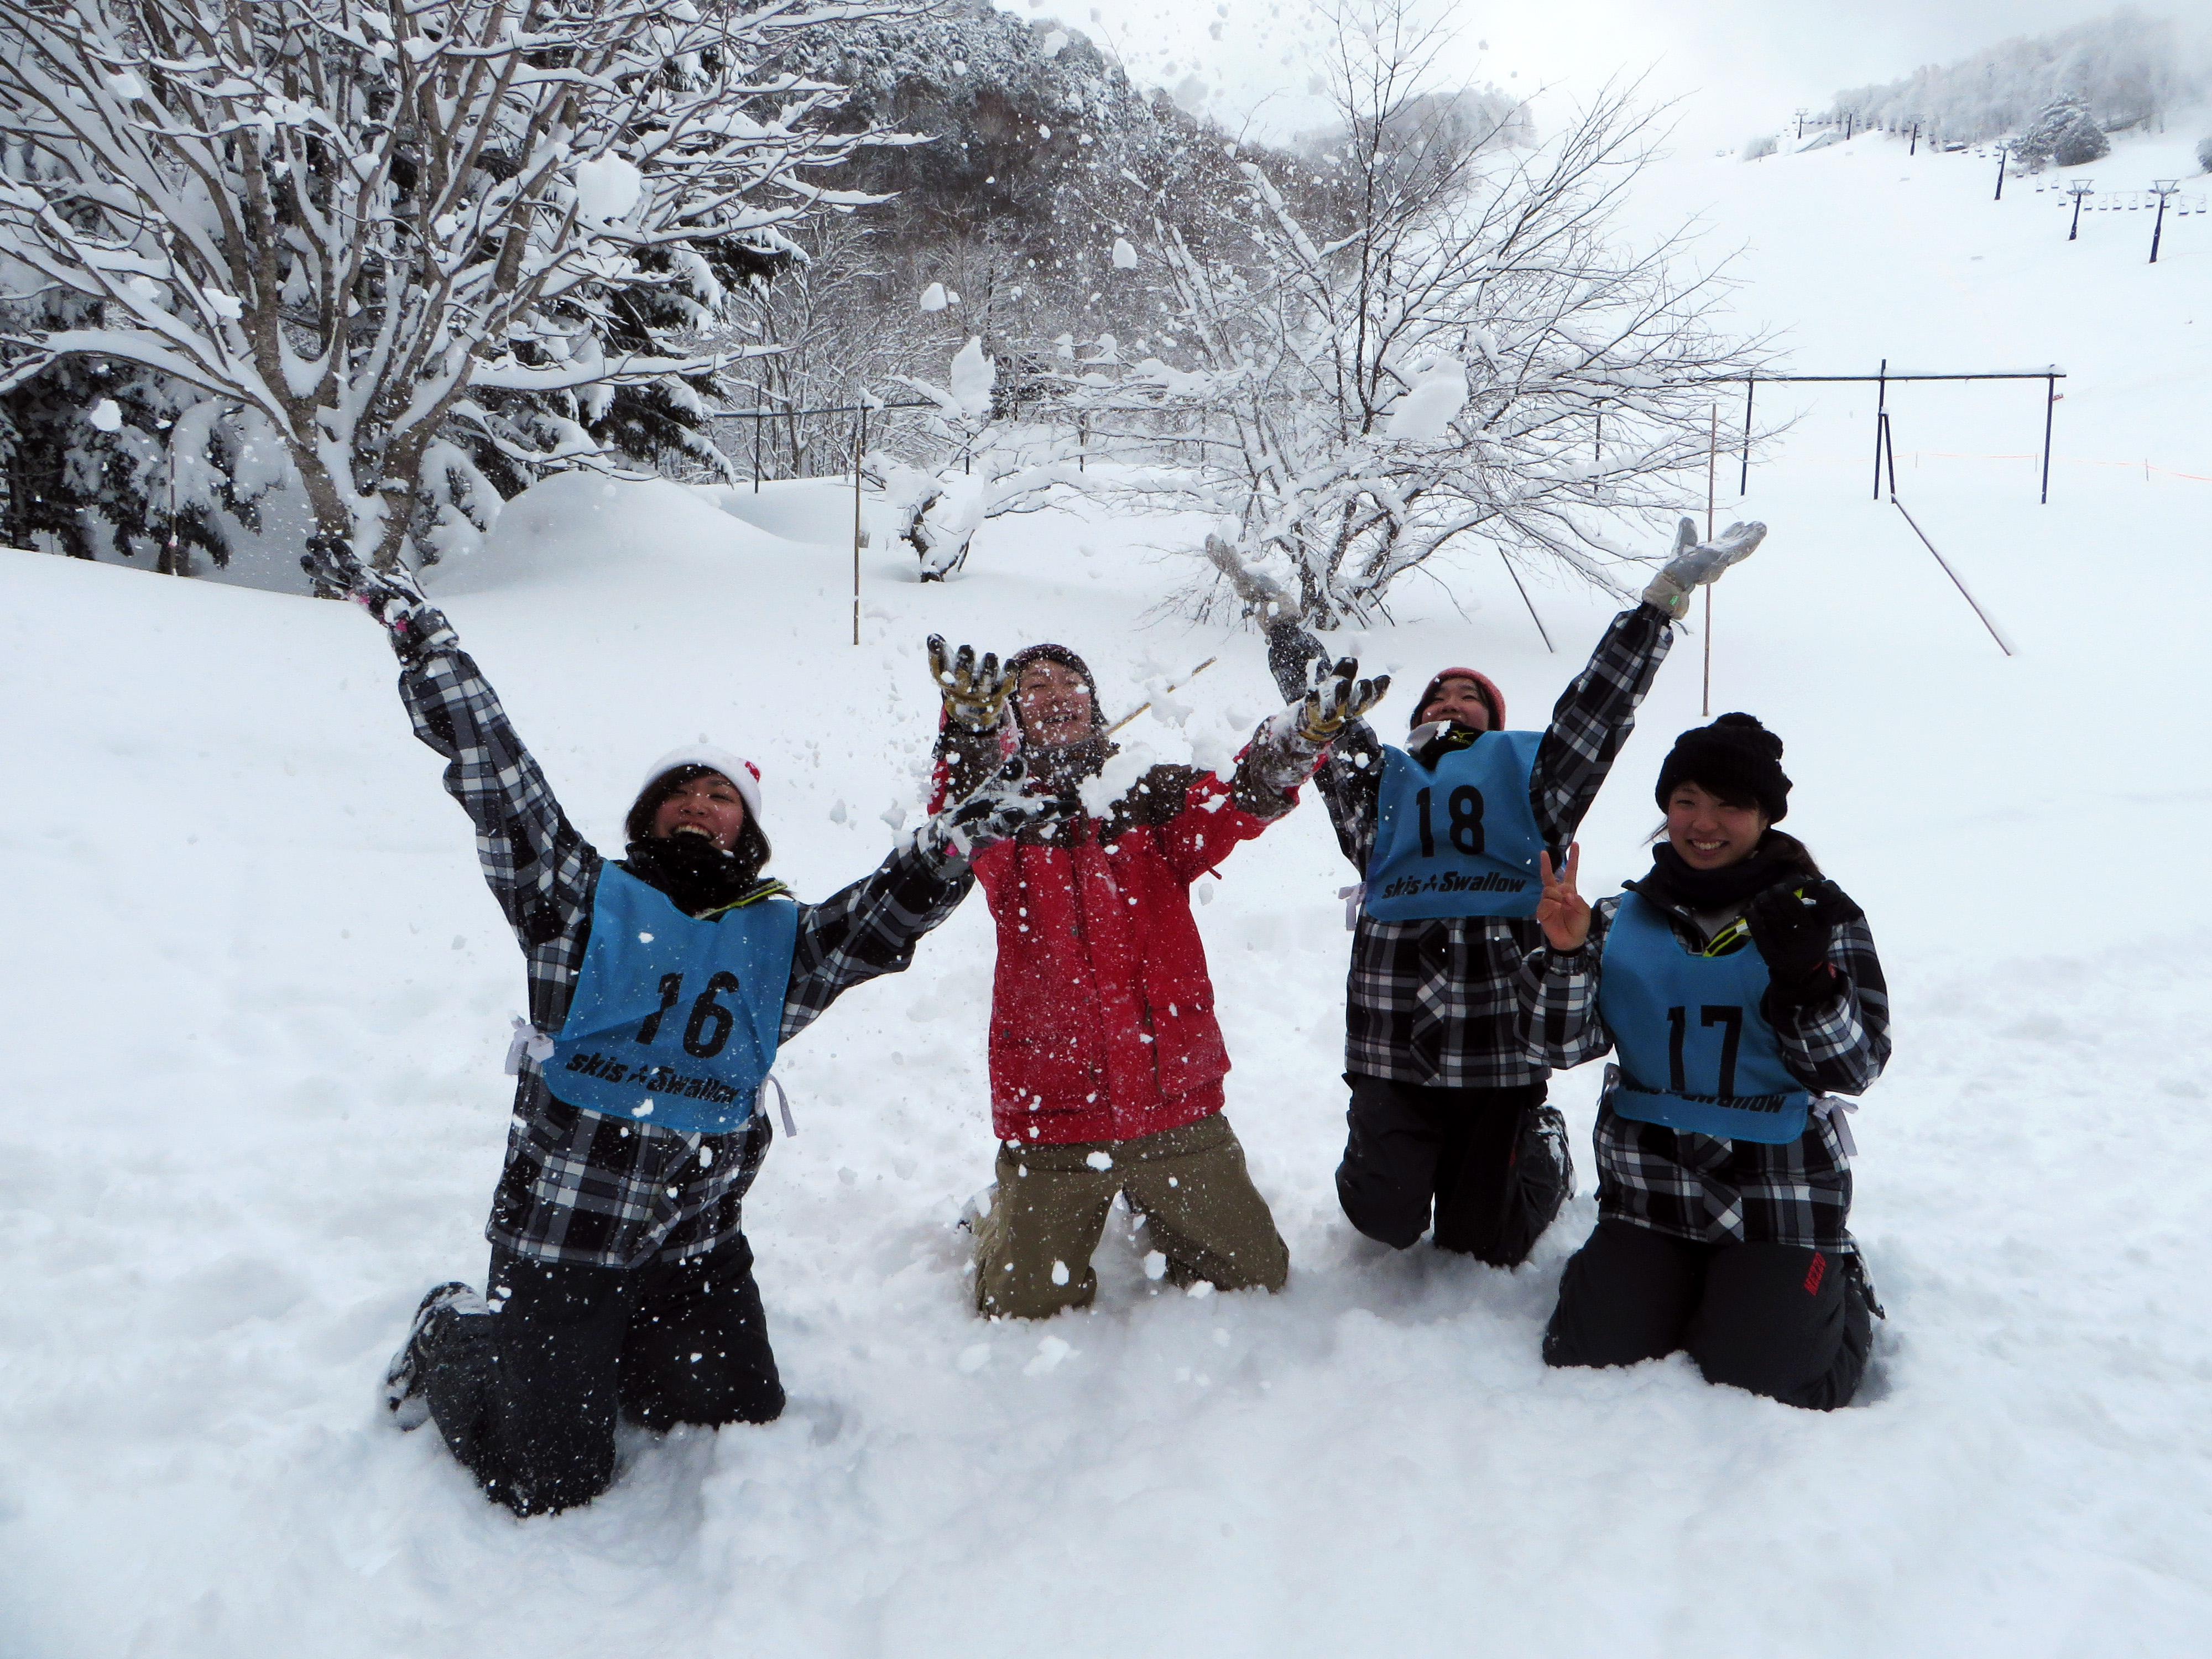 http://www.edusys.jp/mukogawa-u/mukolog/IMG_2024.JPG